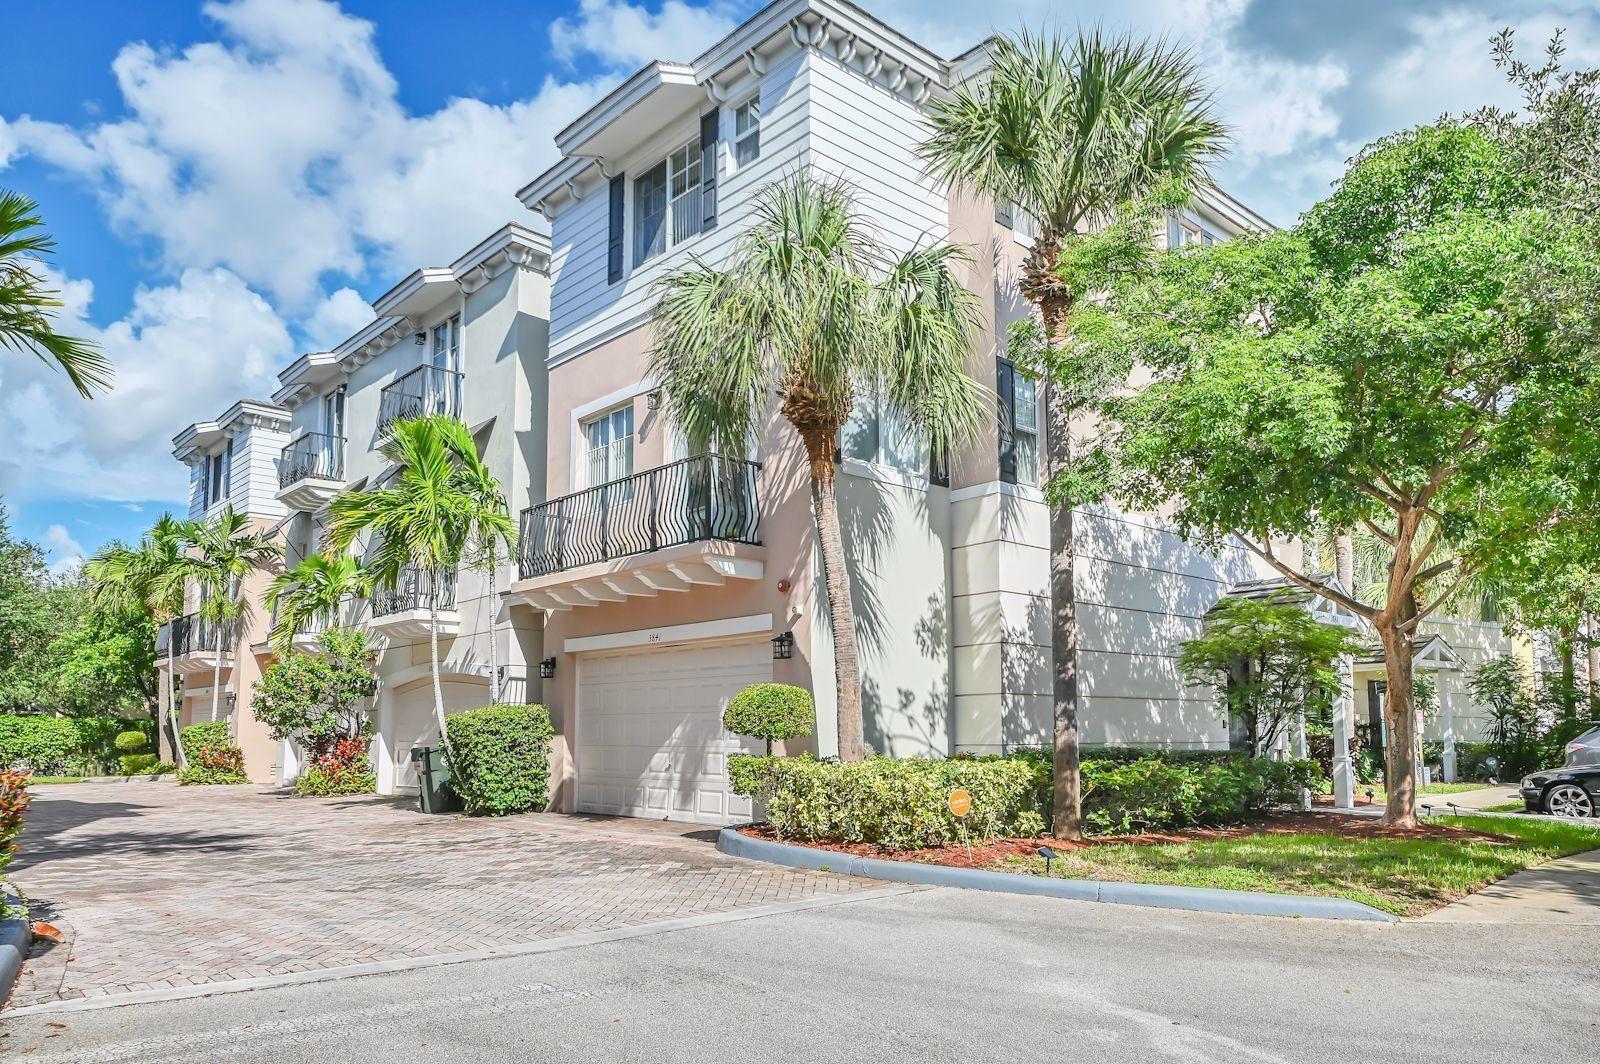 Photo of 3841 NW 5th Terrace, Boca Raton, FL 33431 (MLS # RX-10736296)